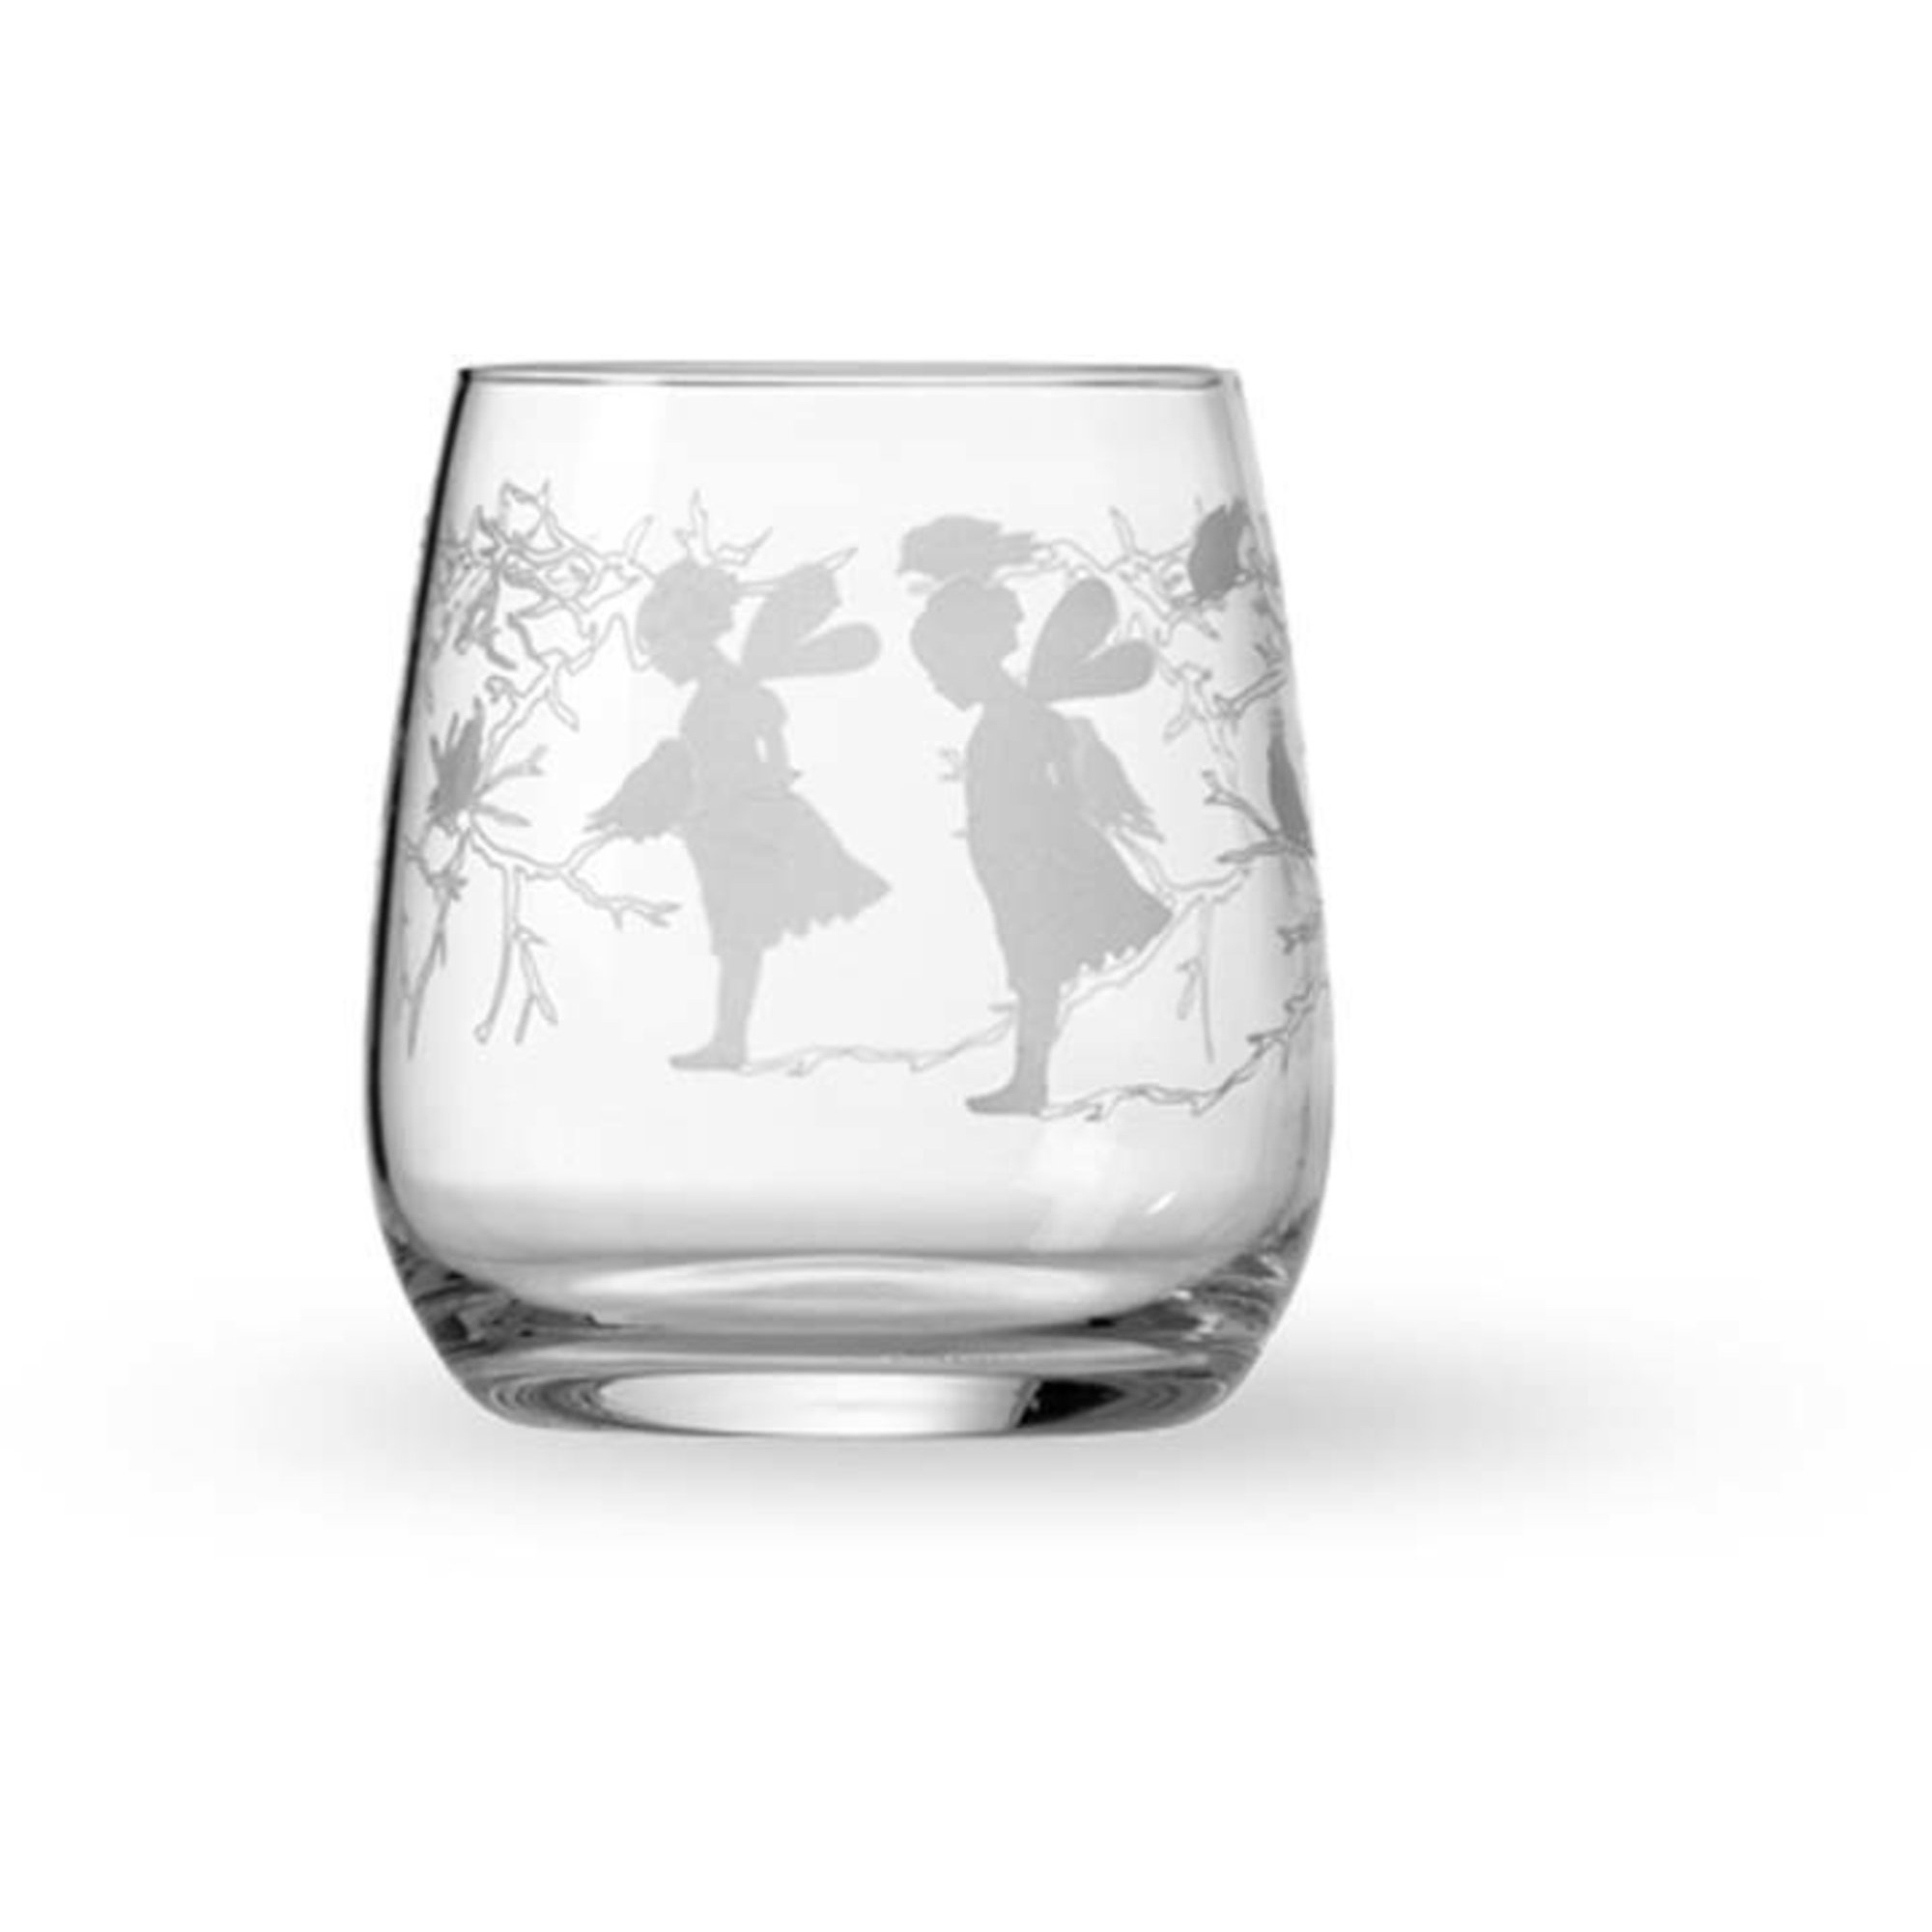 Wik & Walsøe Alv Vattenglas 37 cl